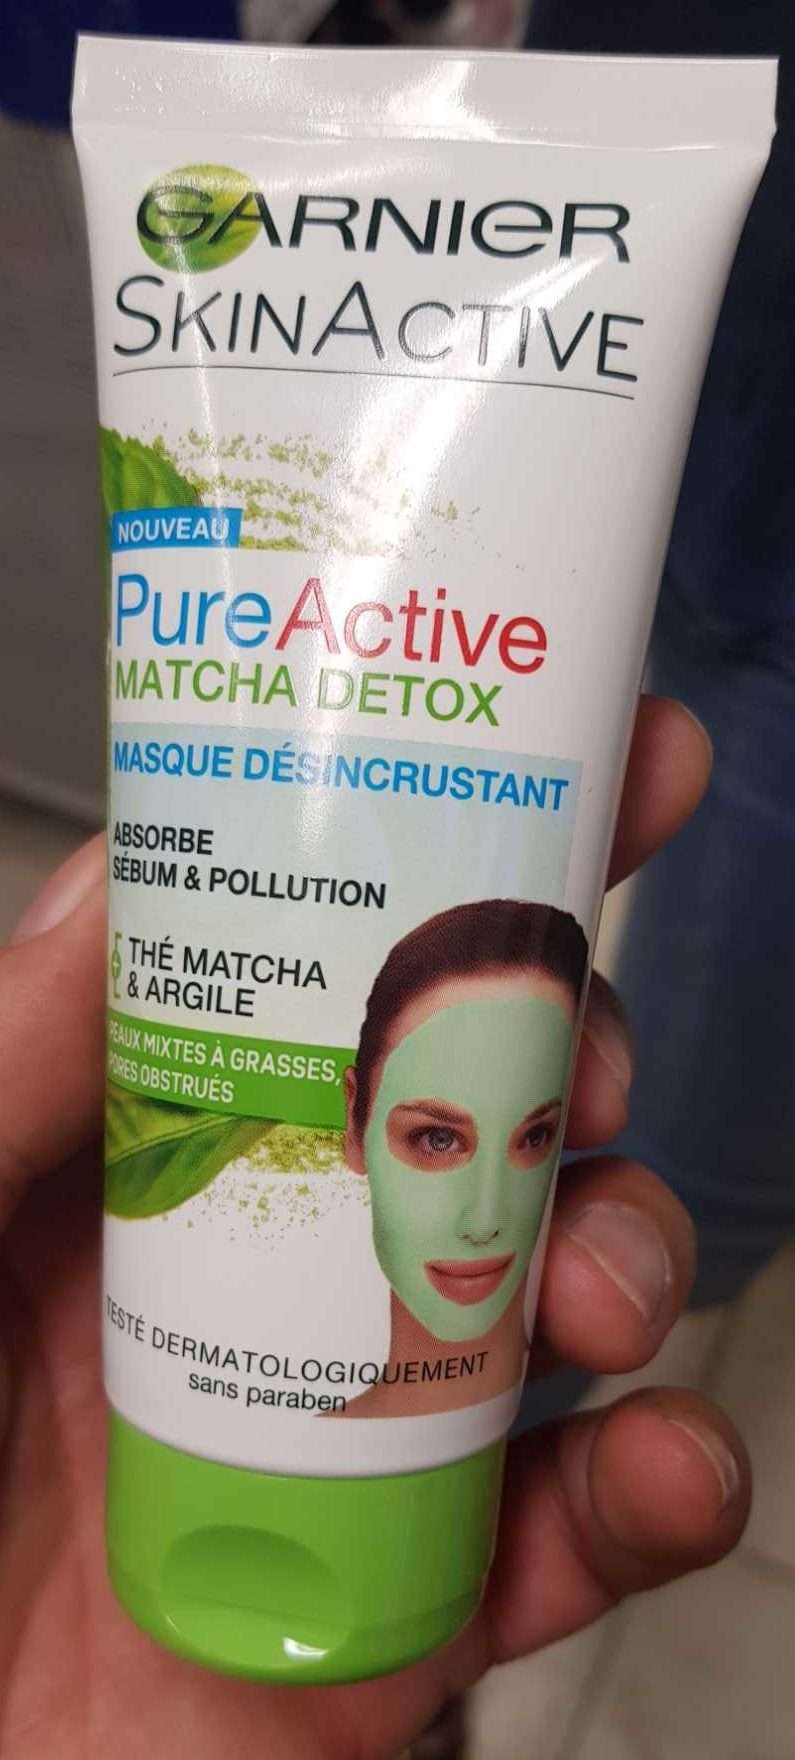 Skinactive - Product